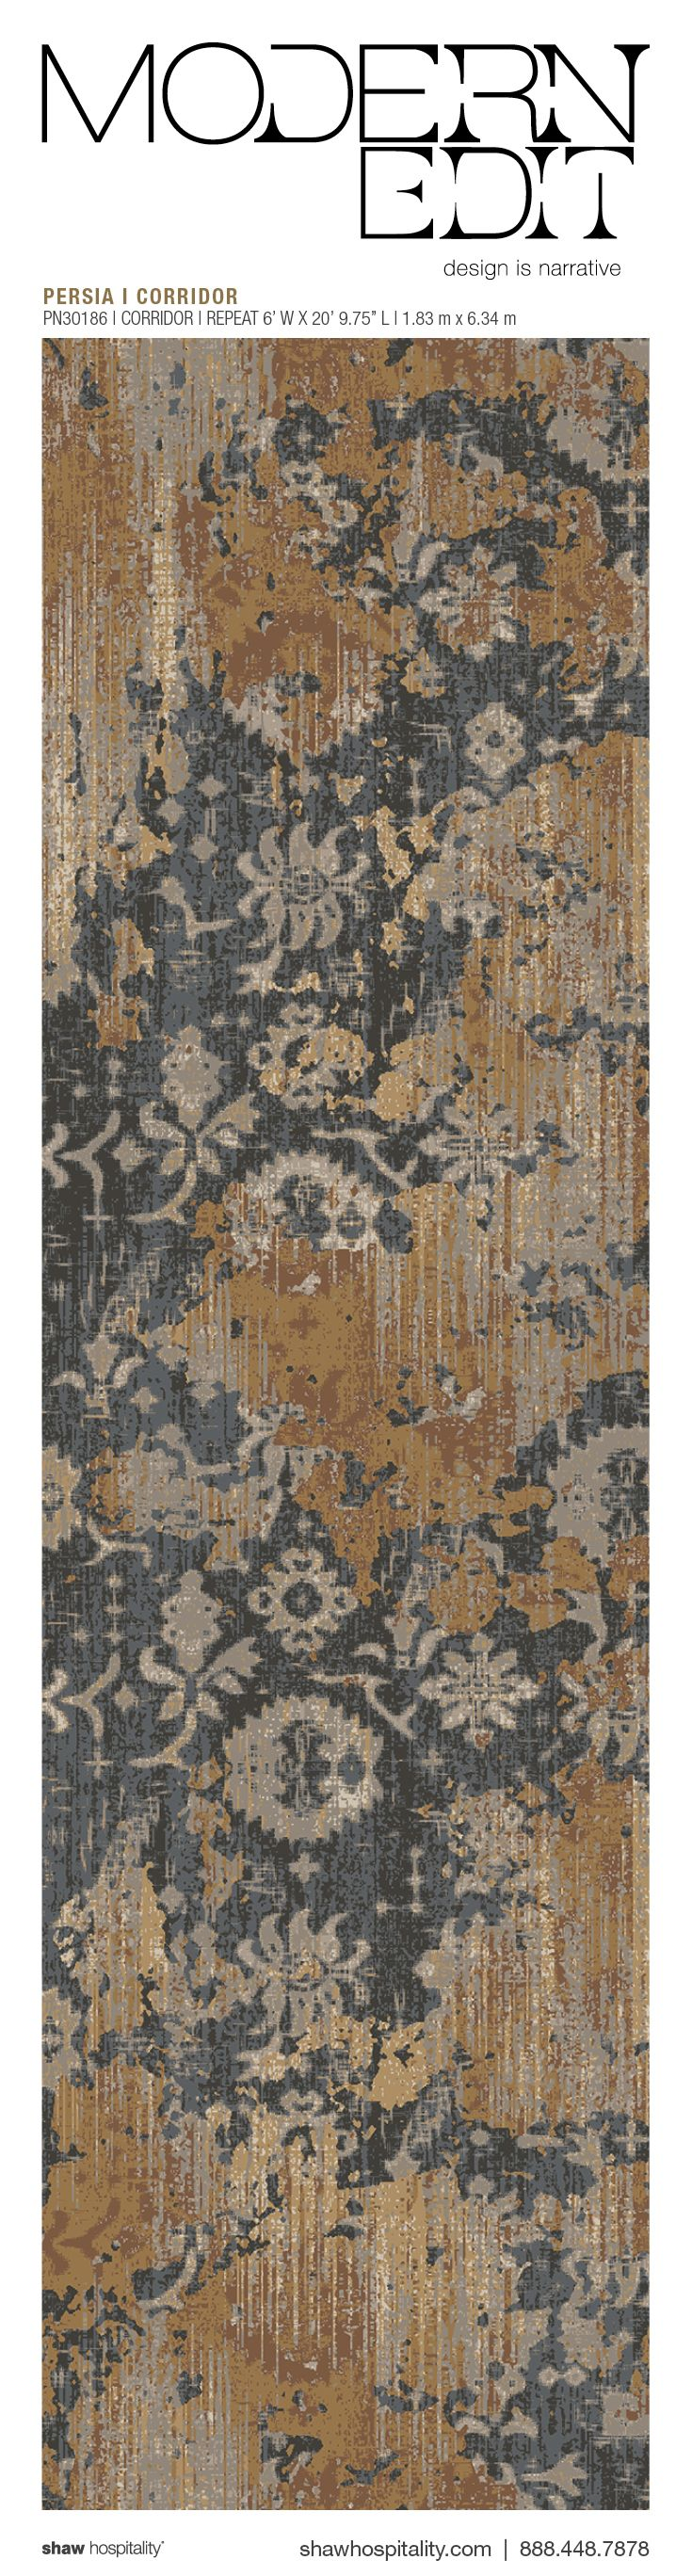 121 best shaw hospitality carpets pentafloor images on pinterest use our interactive online custom carpet design tool foundry to create custom hospitality carpet designs from shaw hospitality group baanklon Gallery